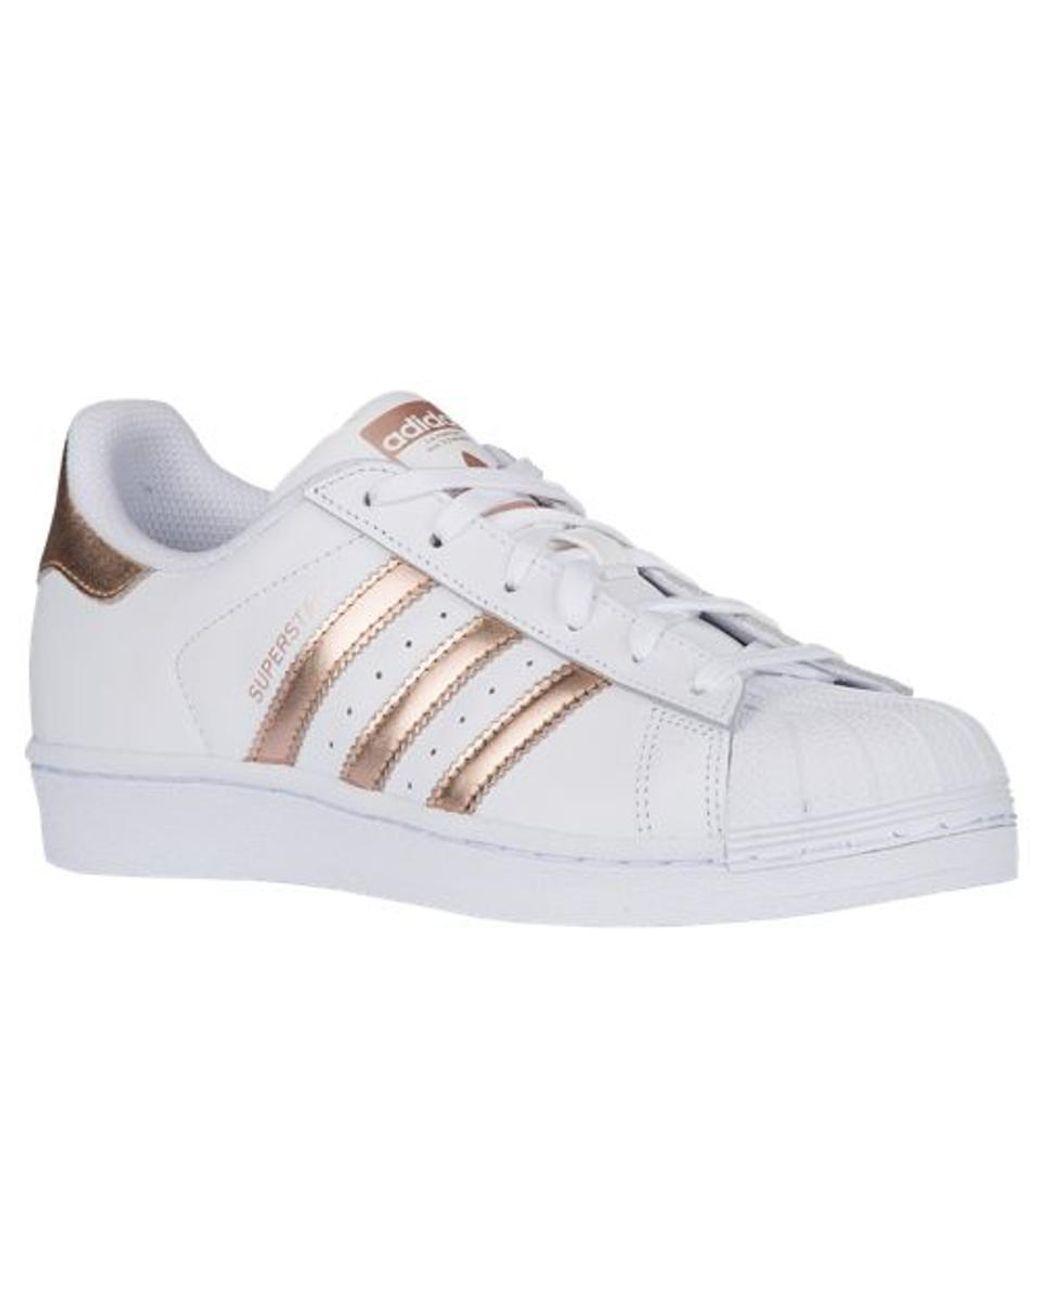 adidas white rose gold superstar- OFF